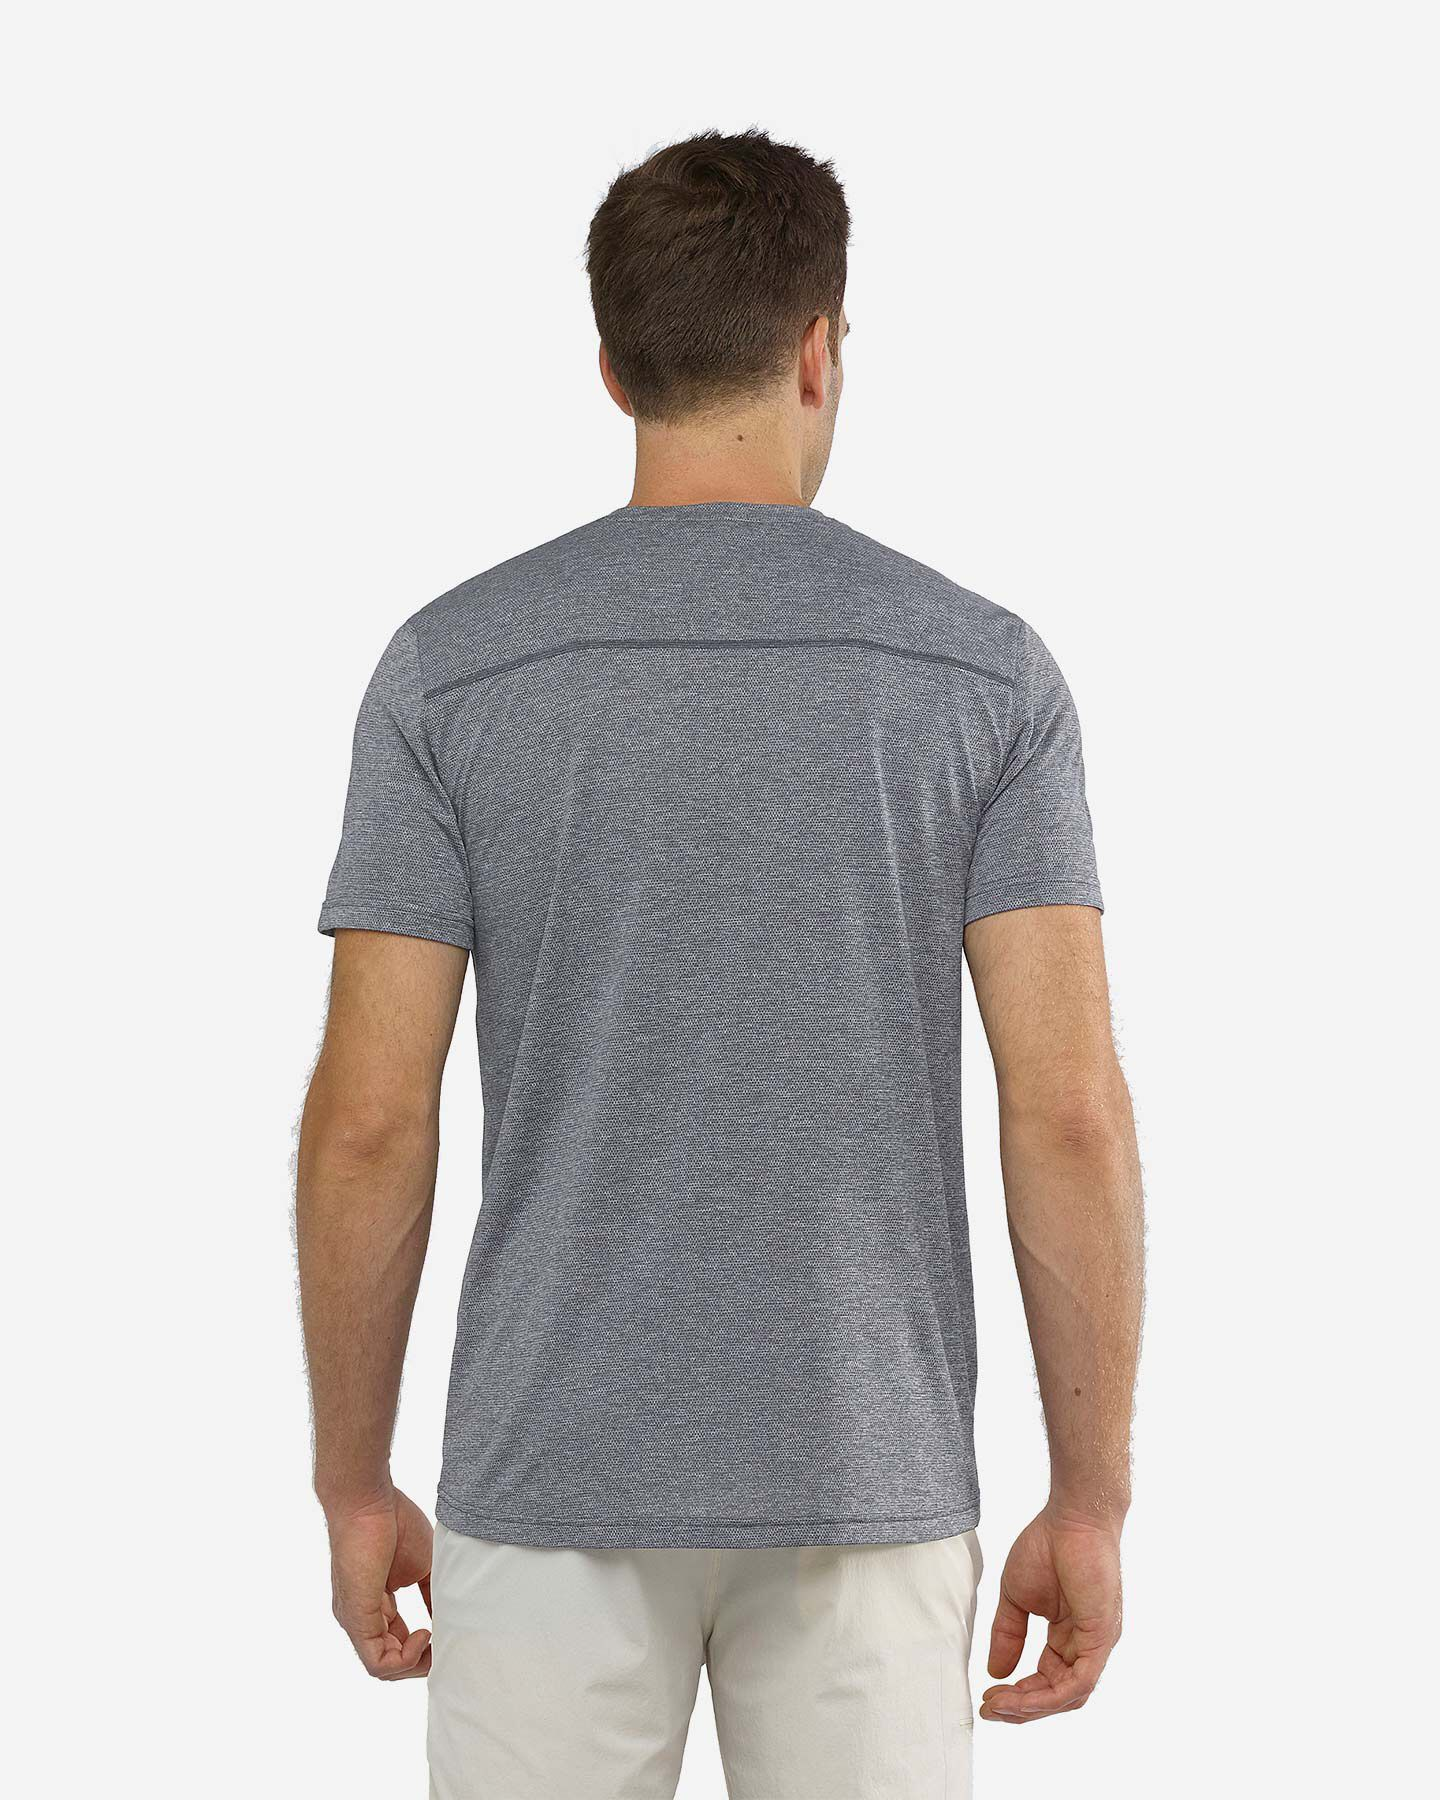 T-Shirt SALOMON EXPLORE PIQUE M S5173794 scatto 3